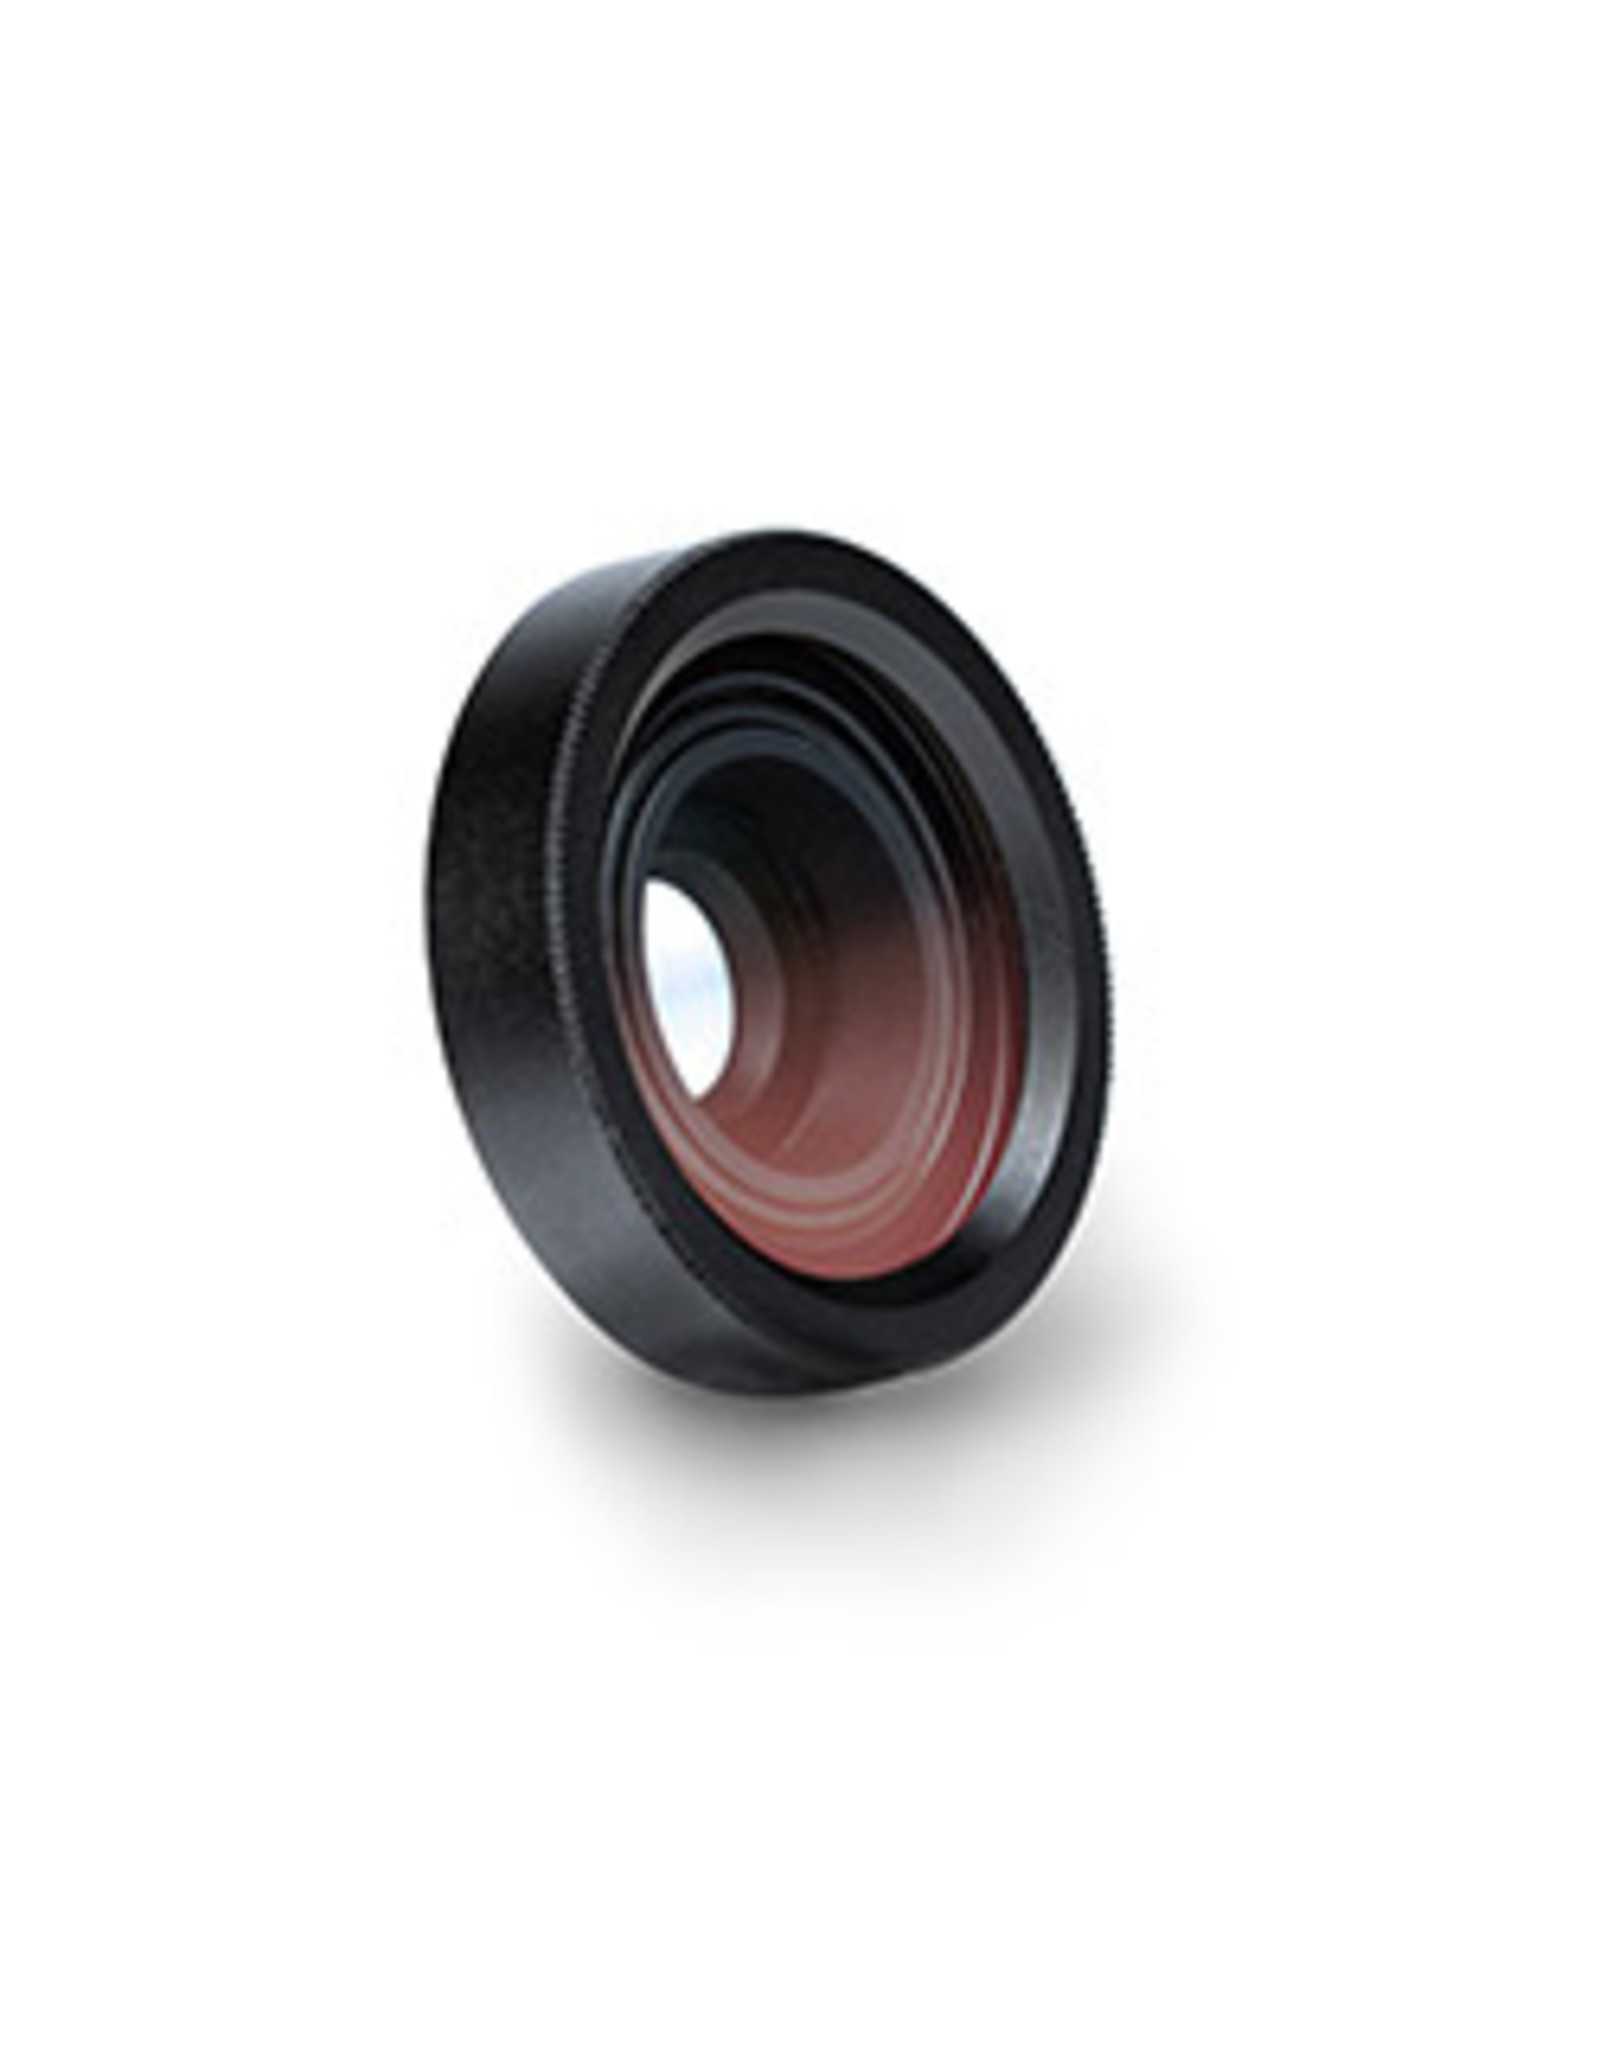 Hitcase TrueLux Macro Lens for Crio/Shield/Pro/Splash case 15-03282